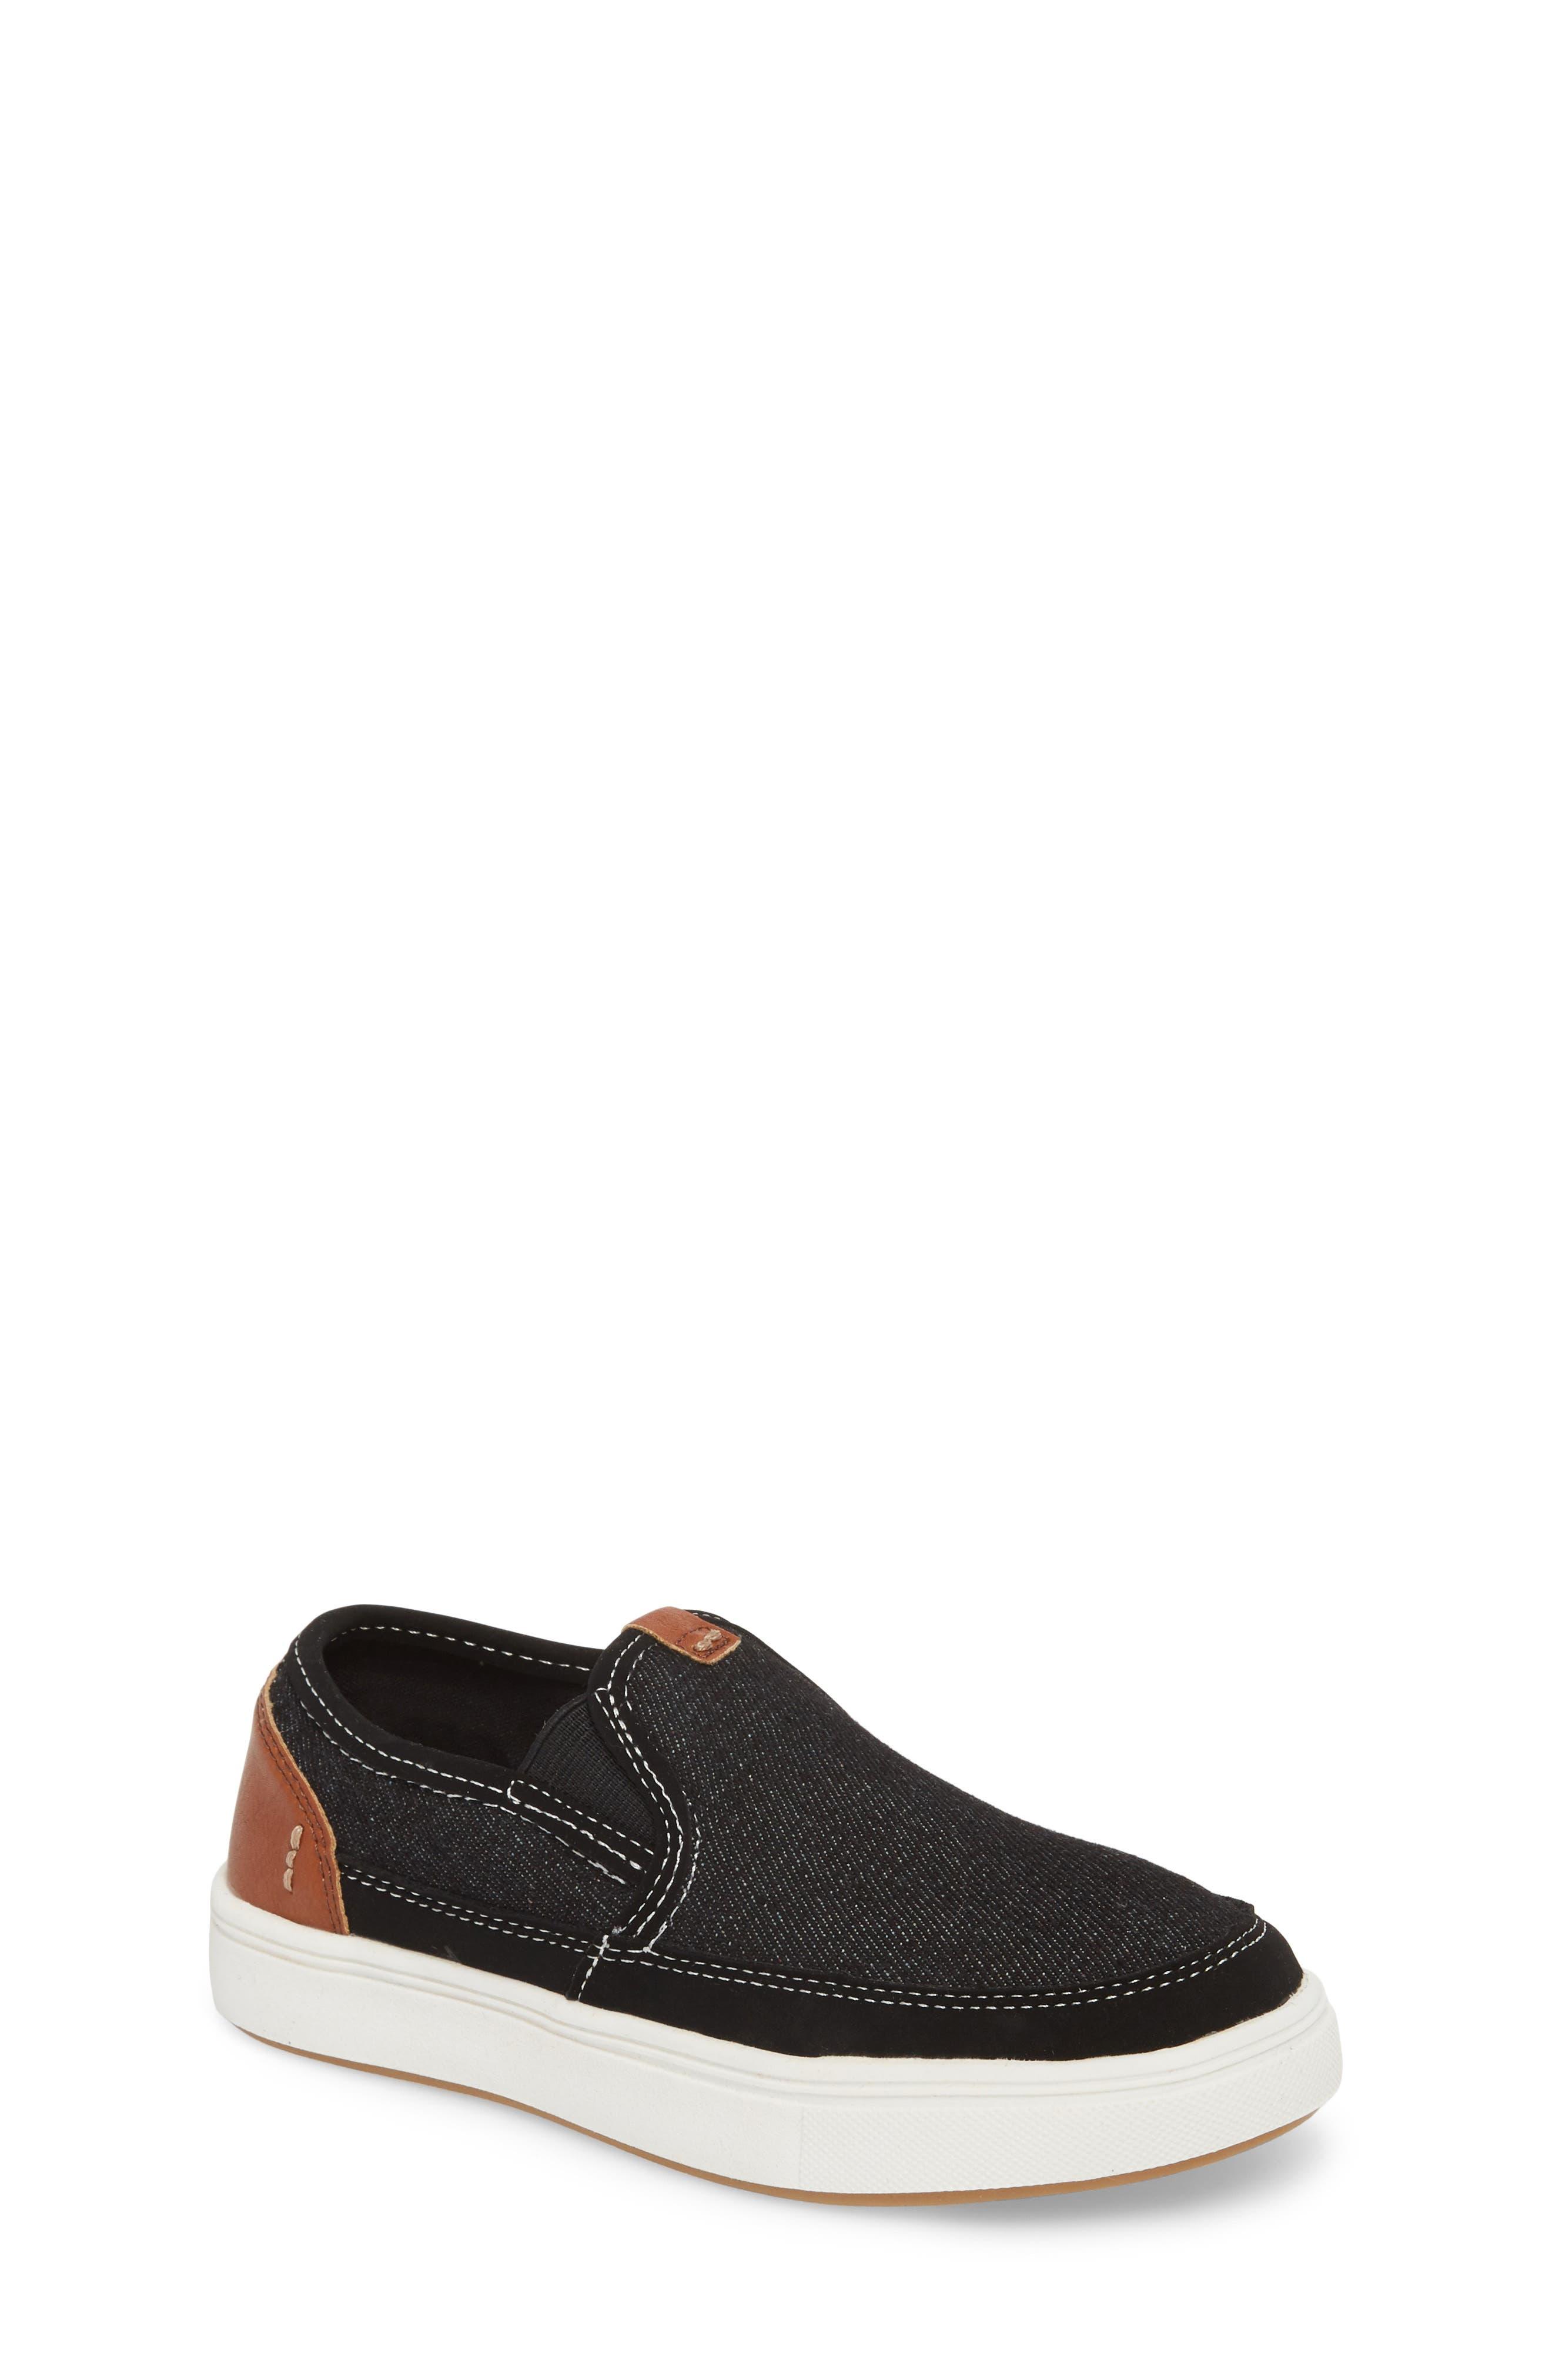 Bfoleeo Slip-On Sneaker,                         Main,                         color, Black